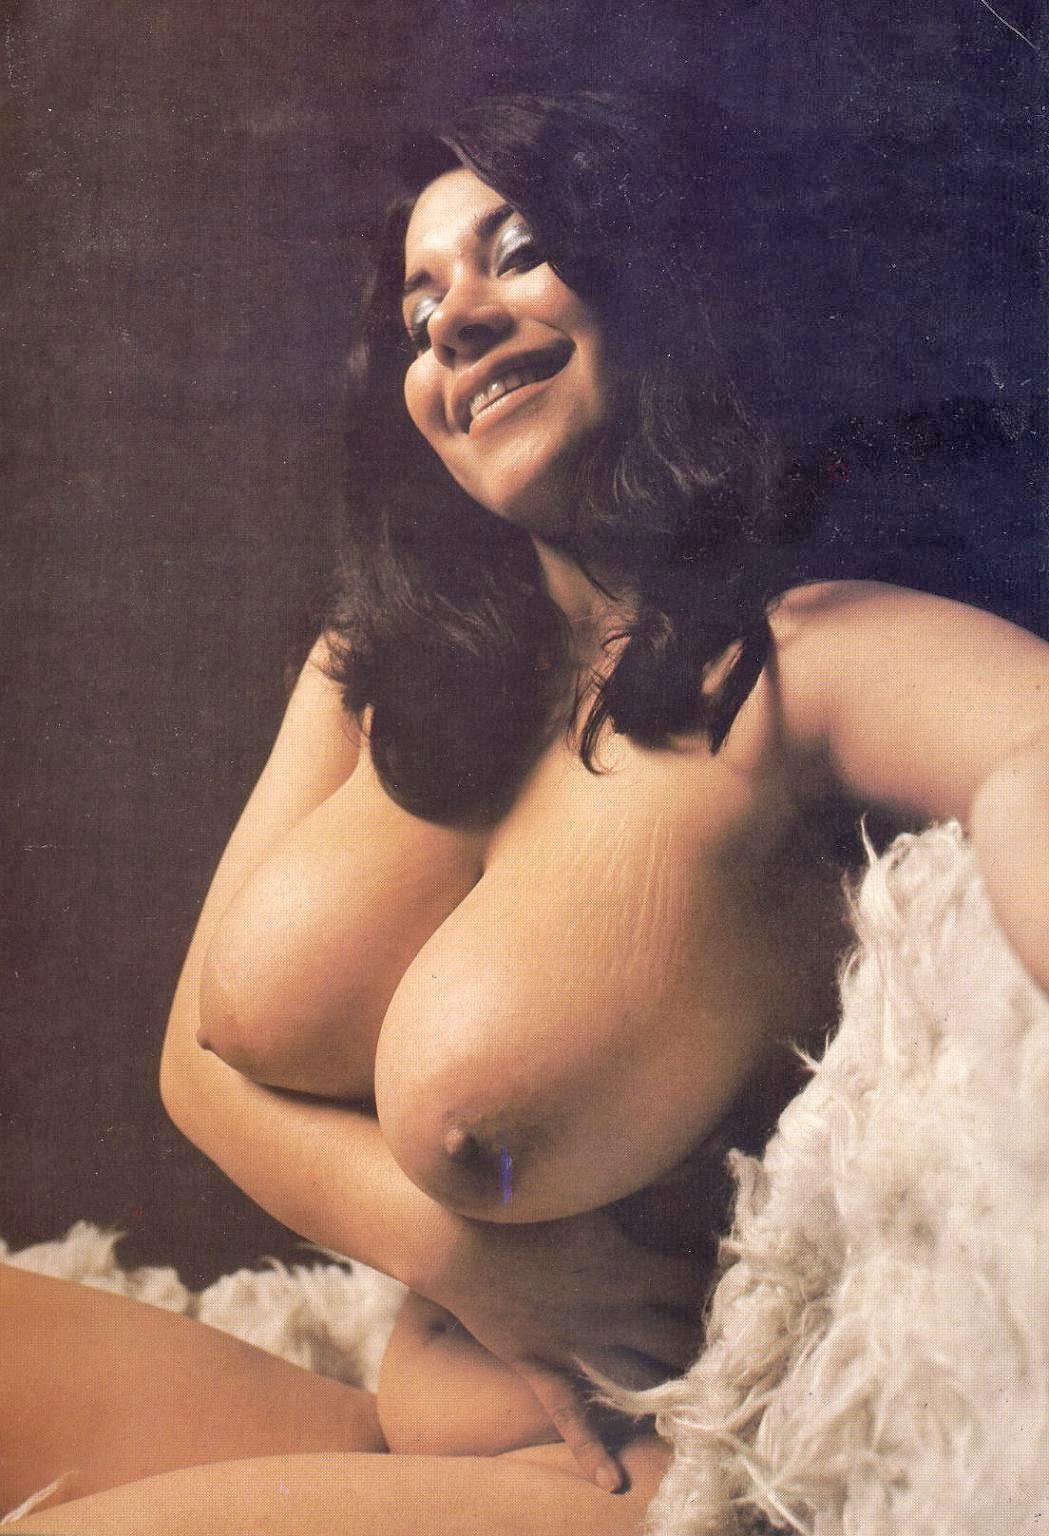 Clyda rosen nude